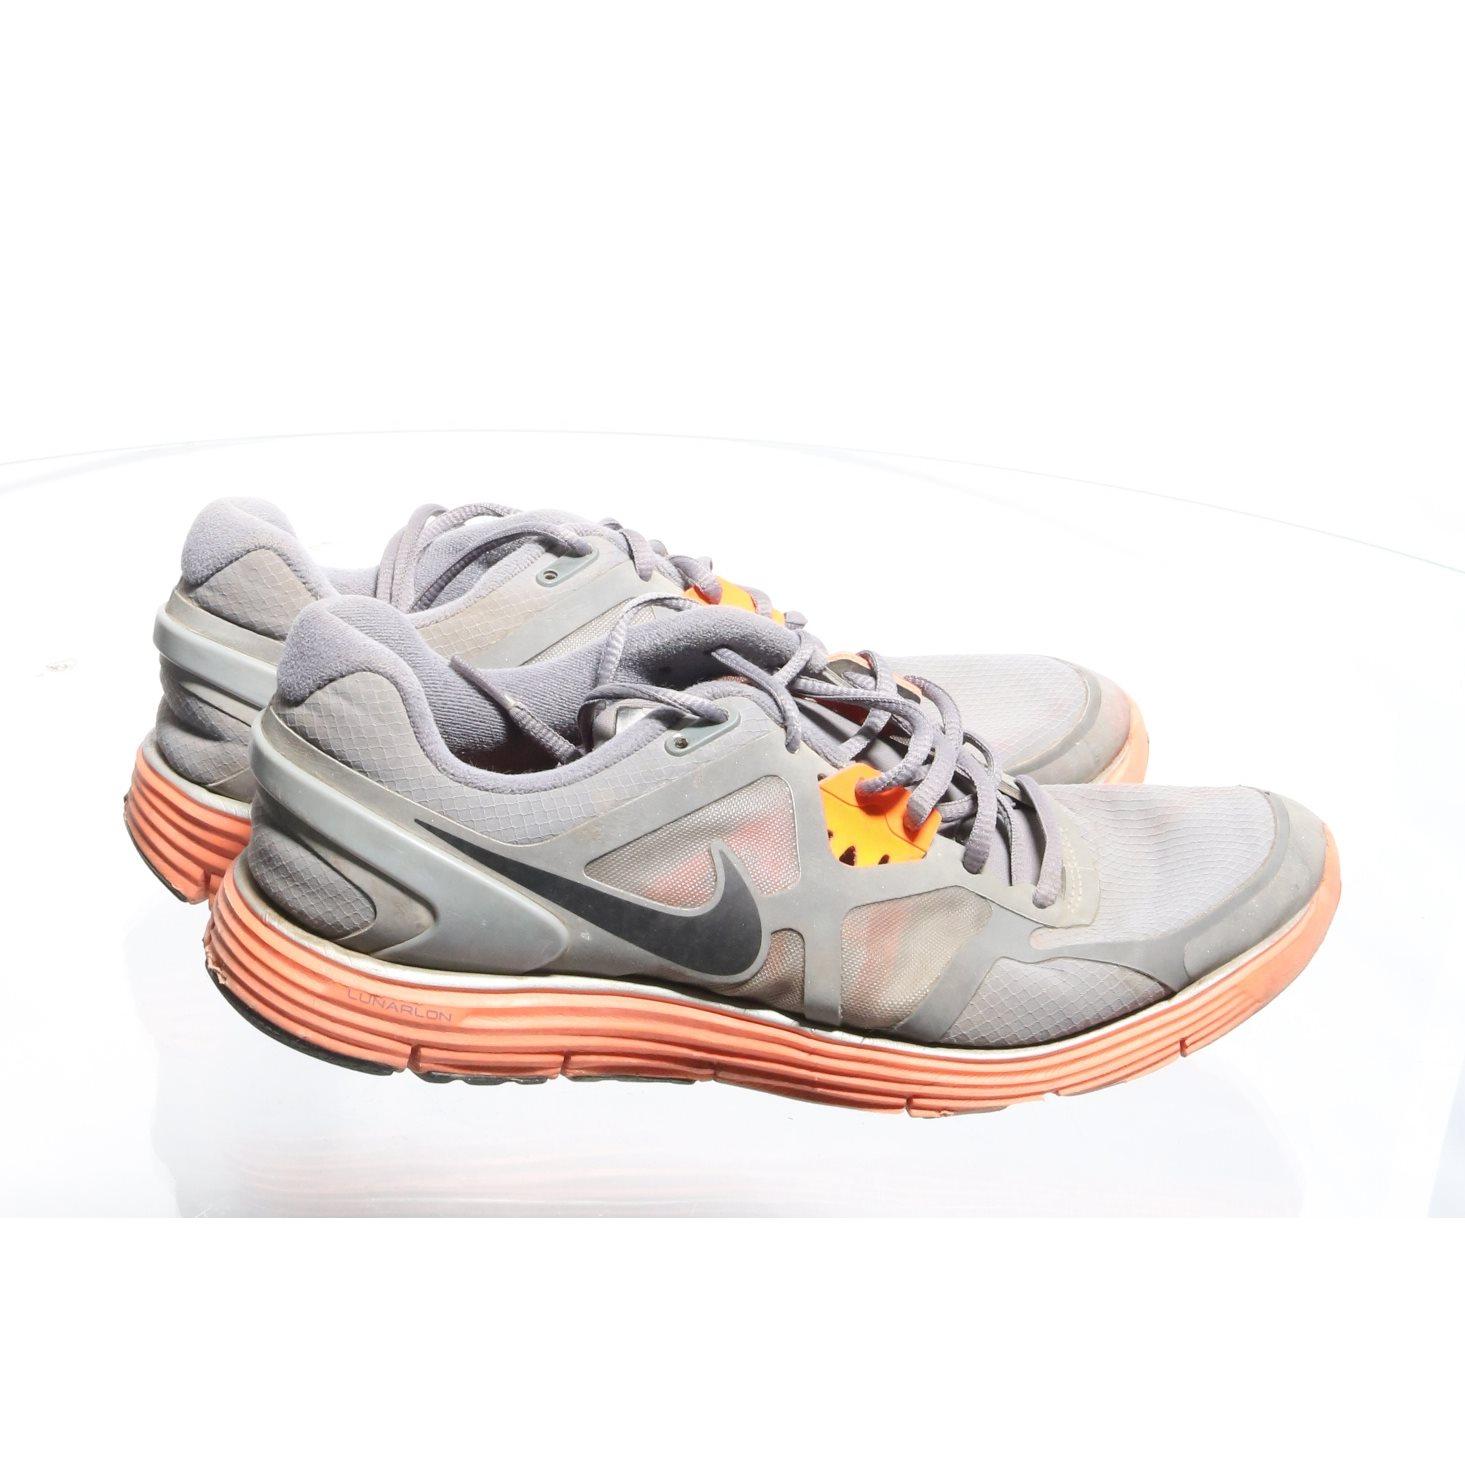 promo code 63aa1 8adda Nike, Träningsskor, Strl  42,5, Lunarglide 3, Grå Orange